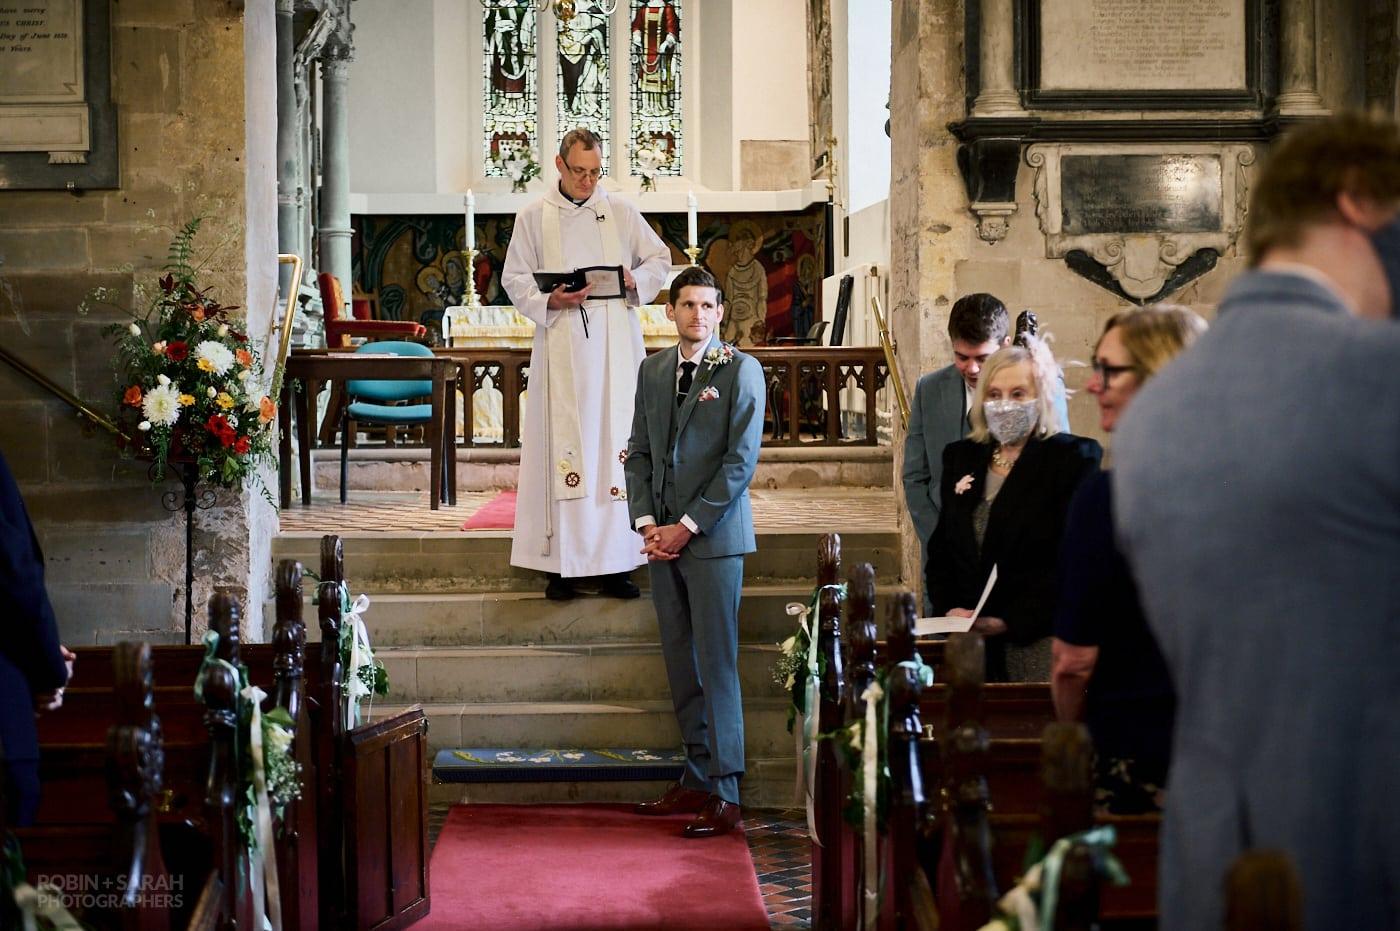 Groom waits for bride at church wedding